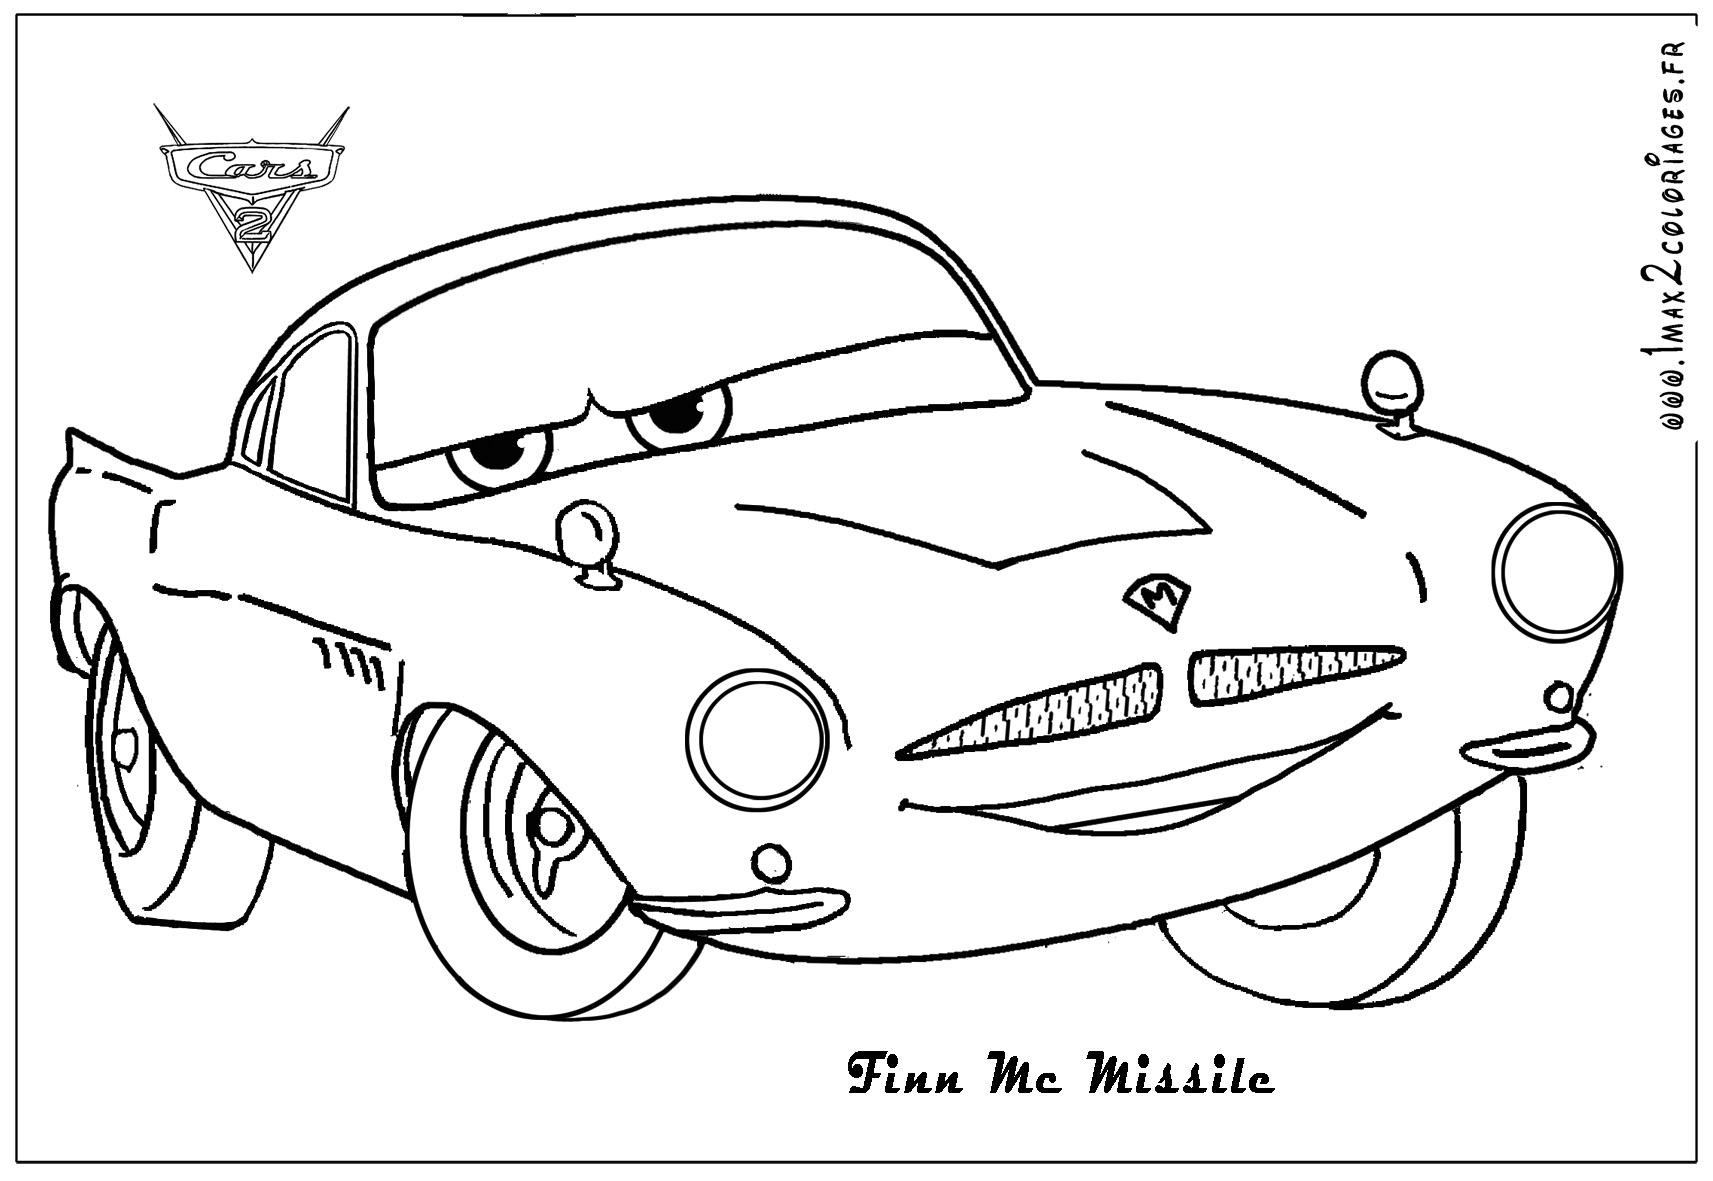 Beau Dessin A Colorier Cars Dinoco